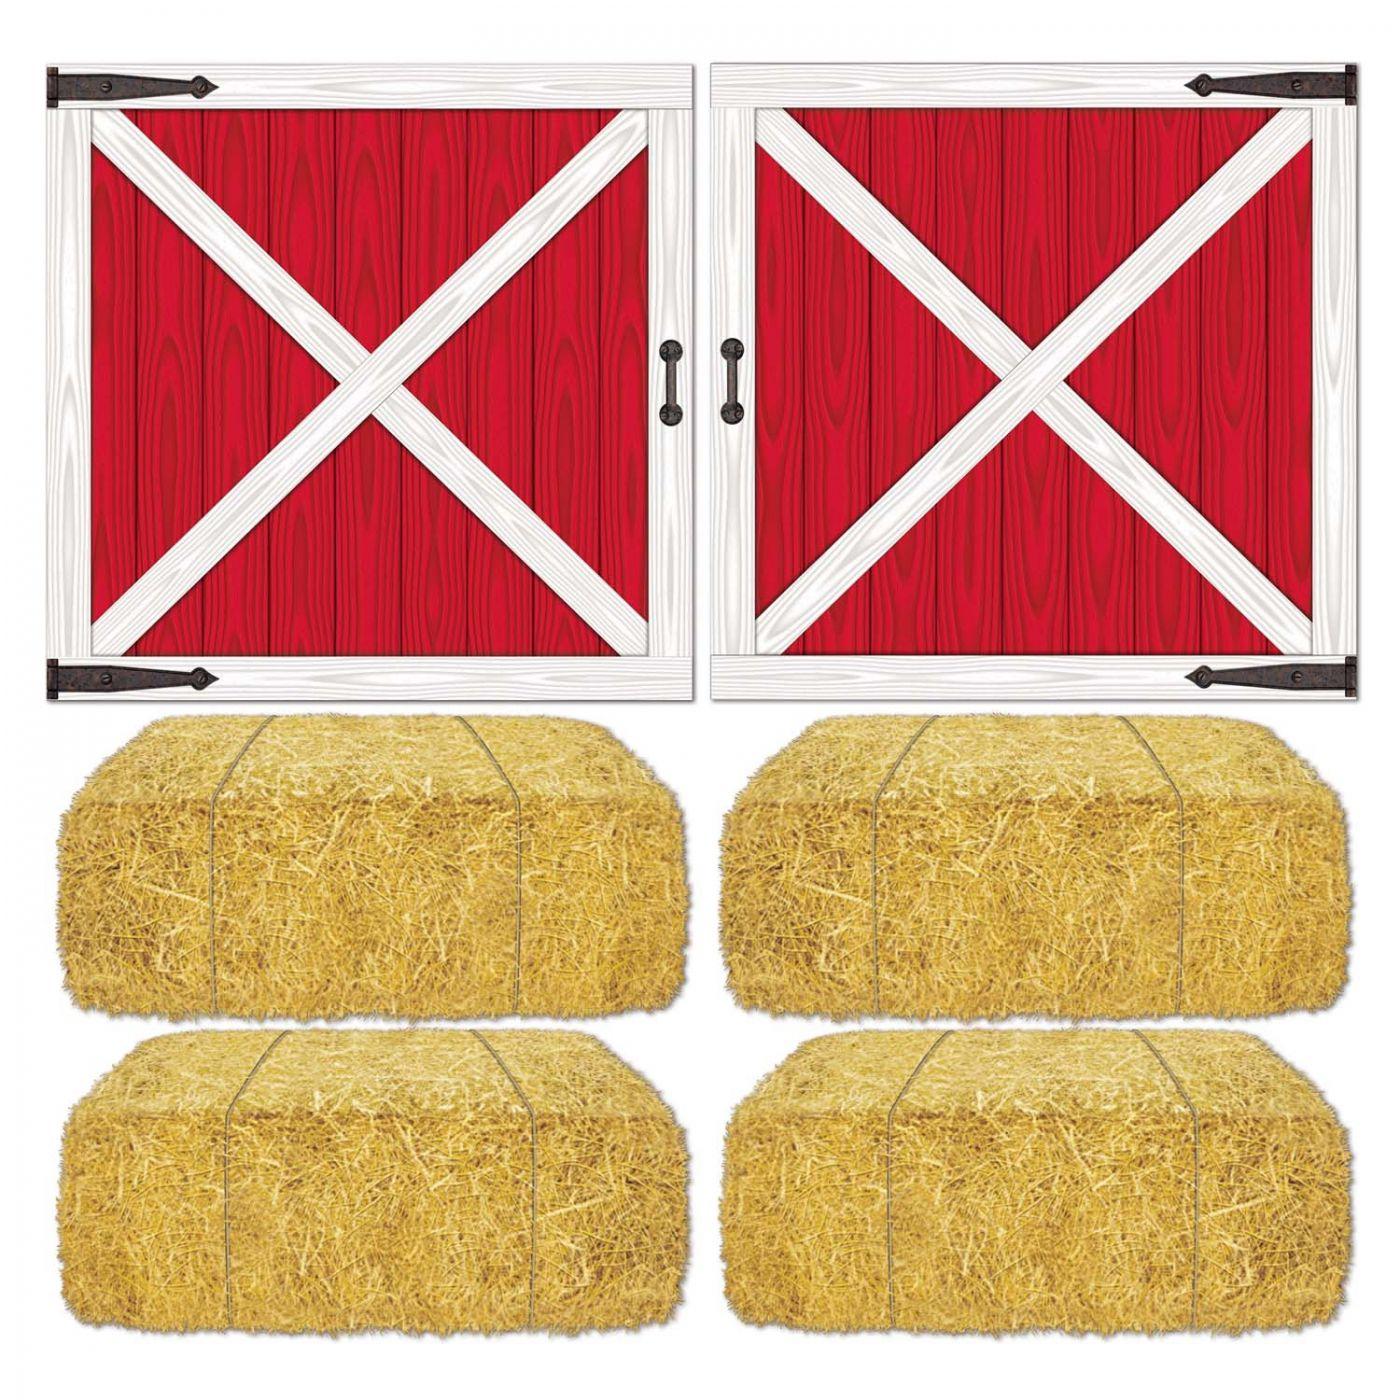 Barn Loft Door & Hay Bale Props image